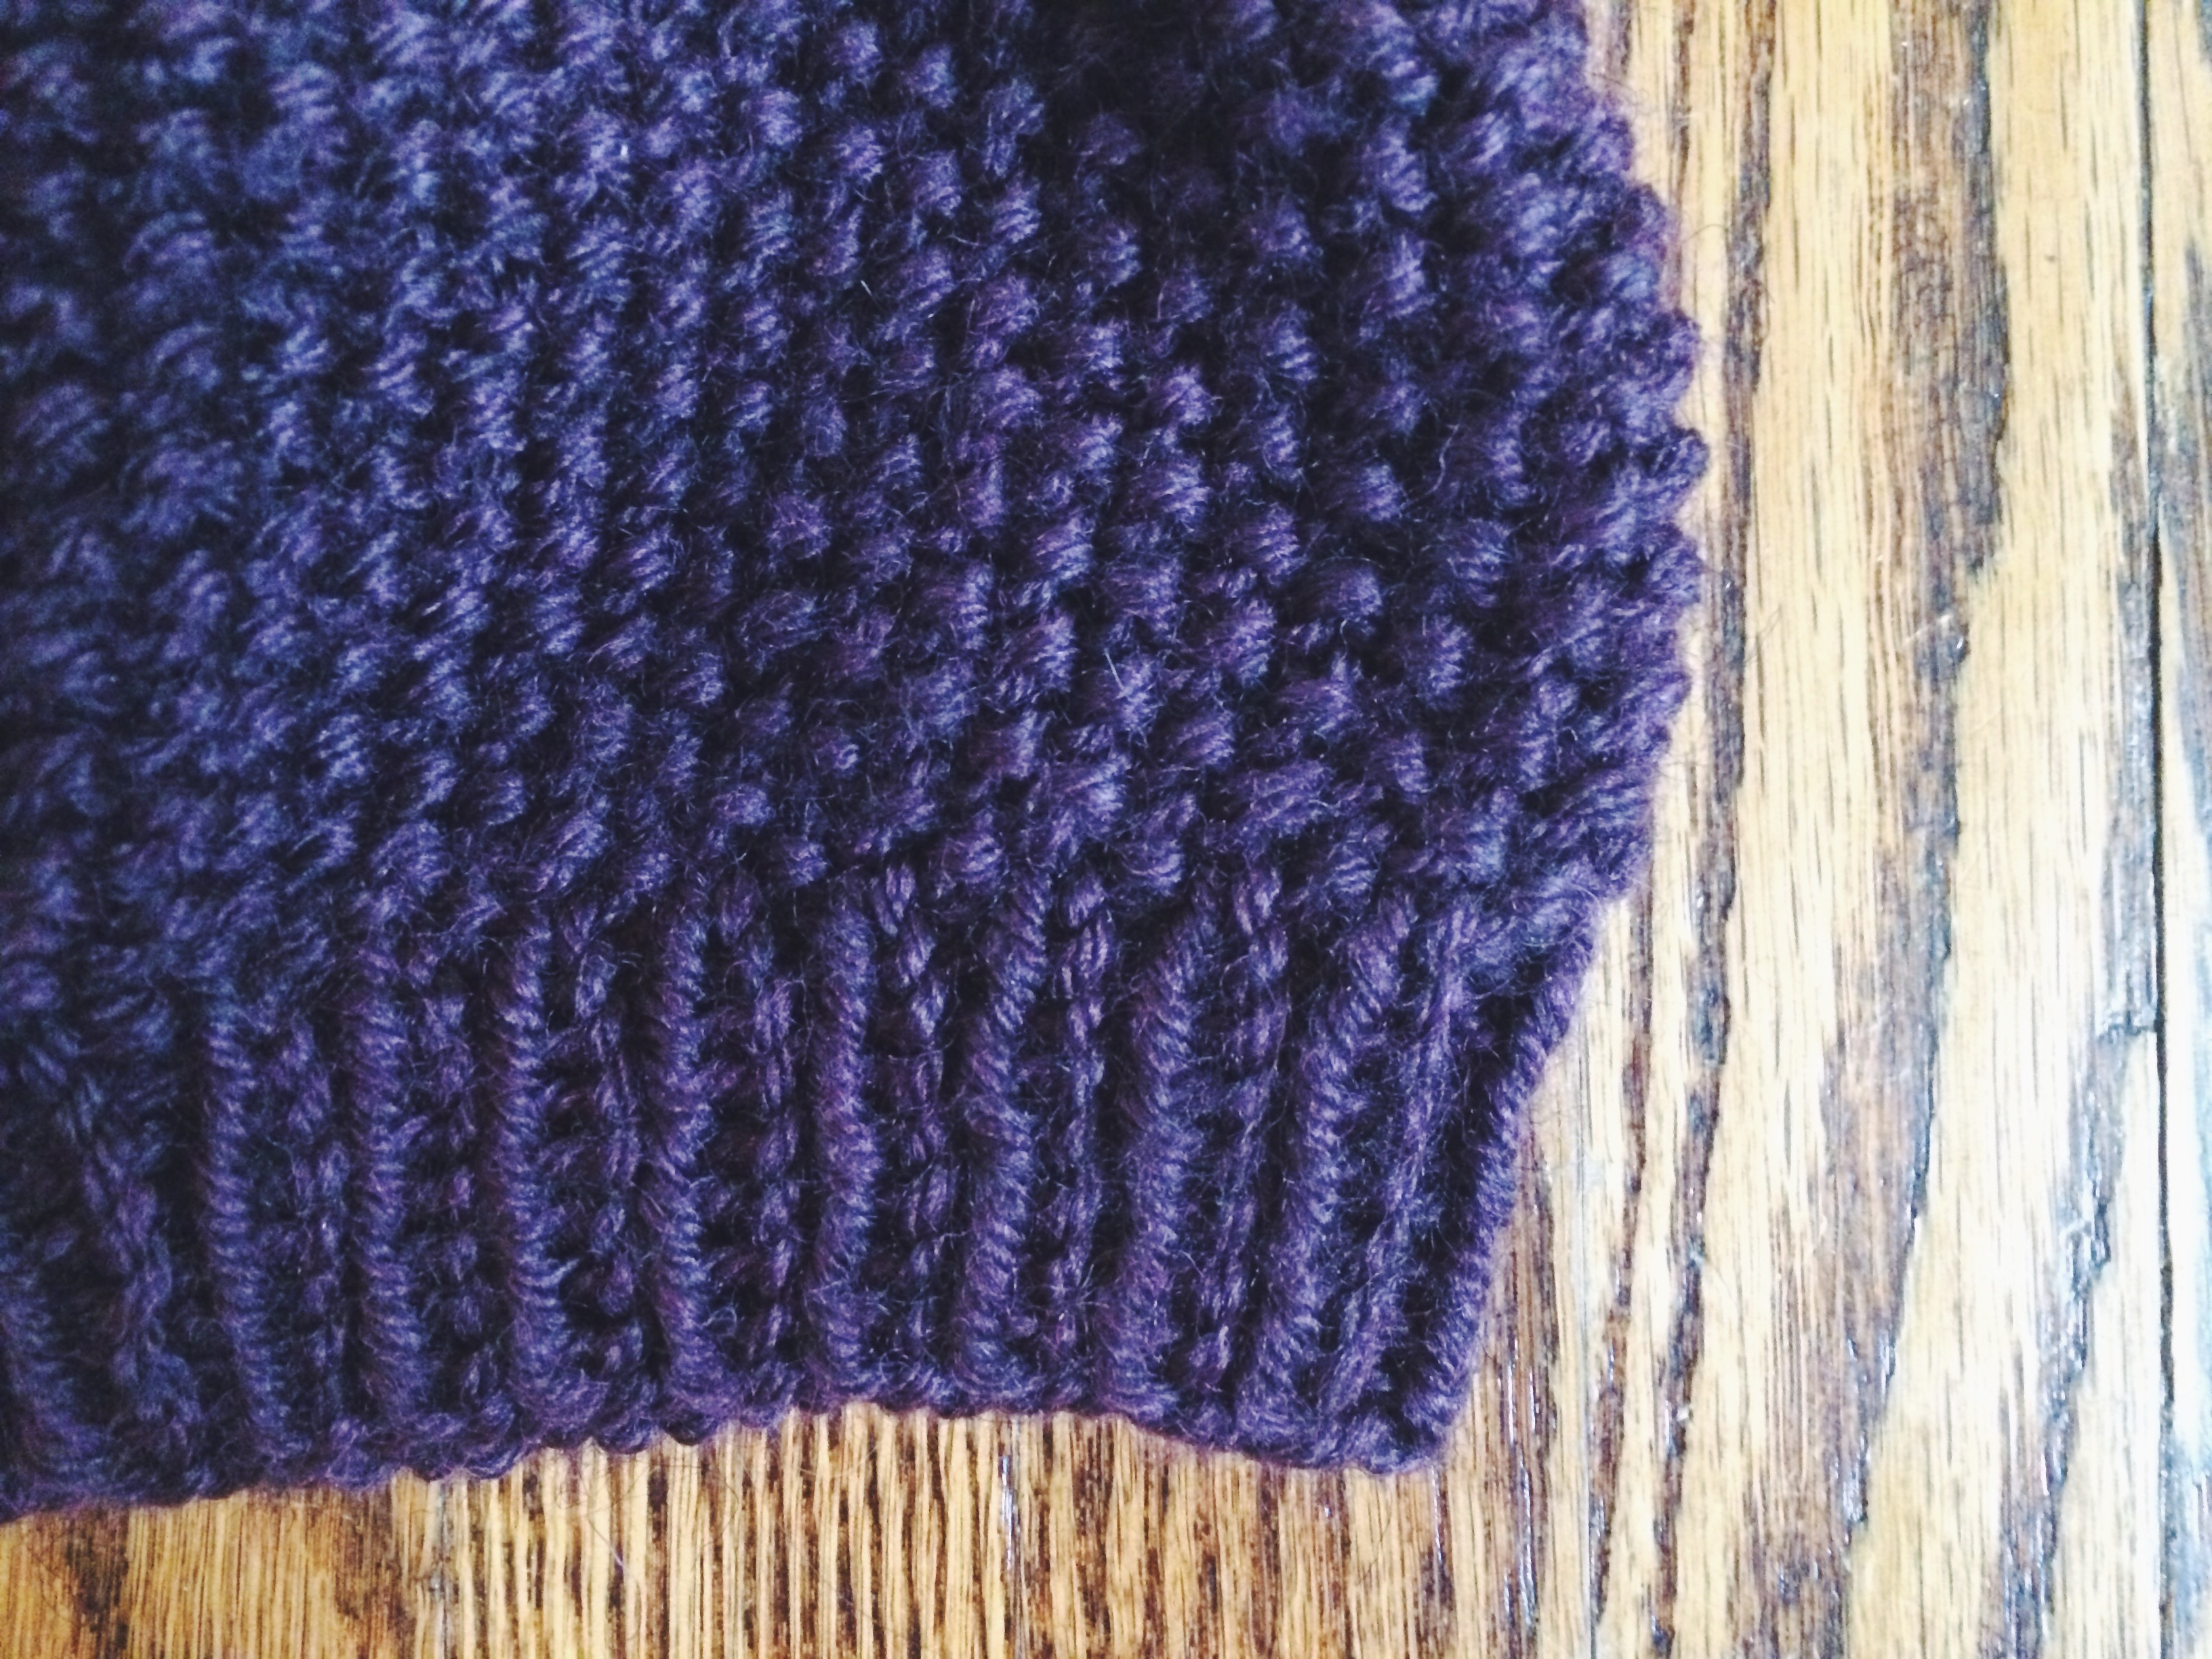 Knitting Seed Stitch Decrease : Knit: Mix Beanie Yarn, Things, Etc.